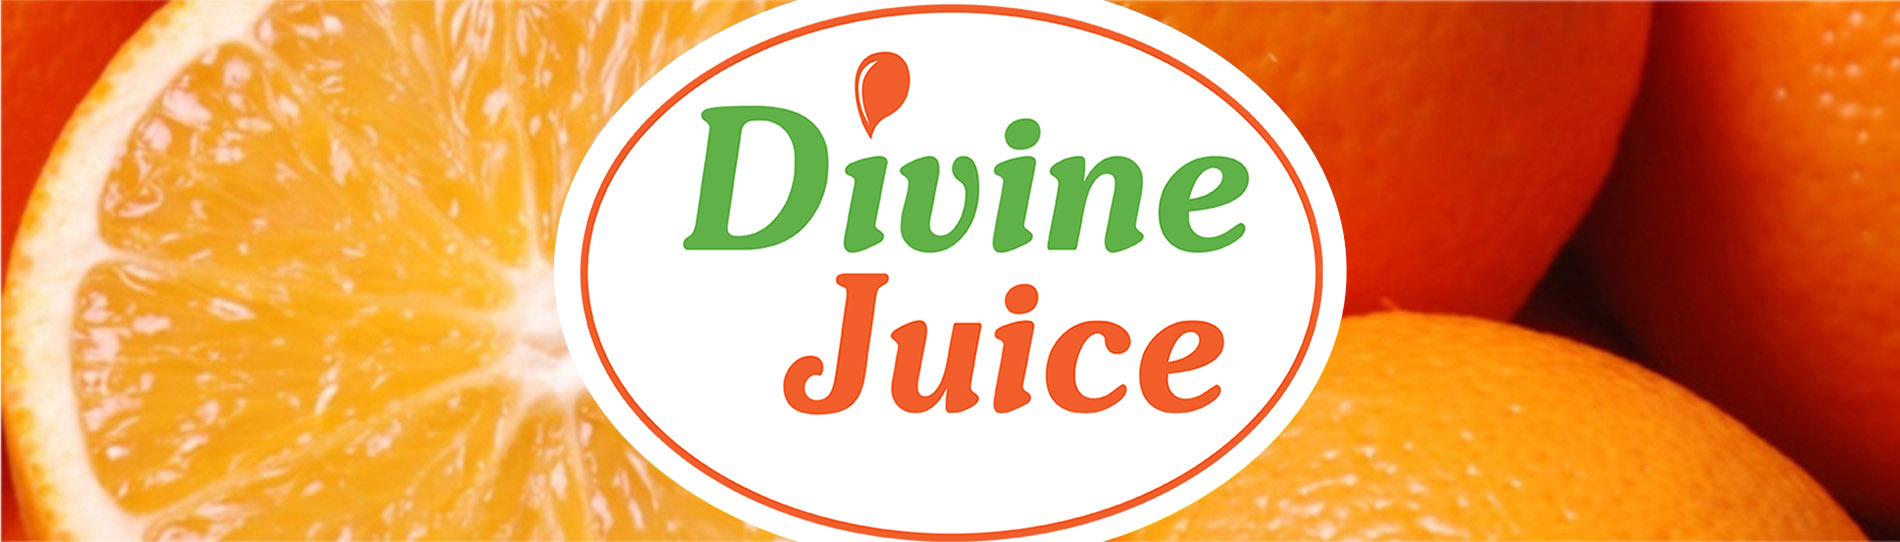 Divine Juice